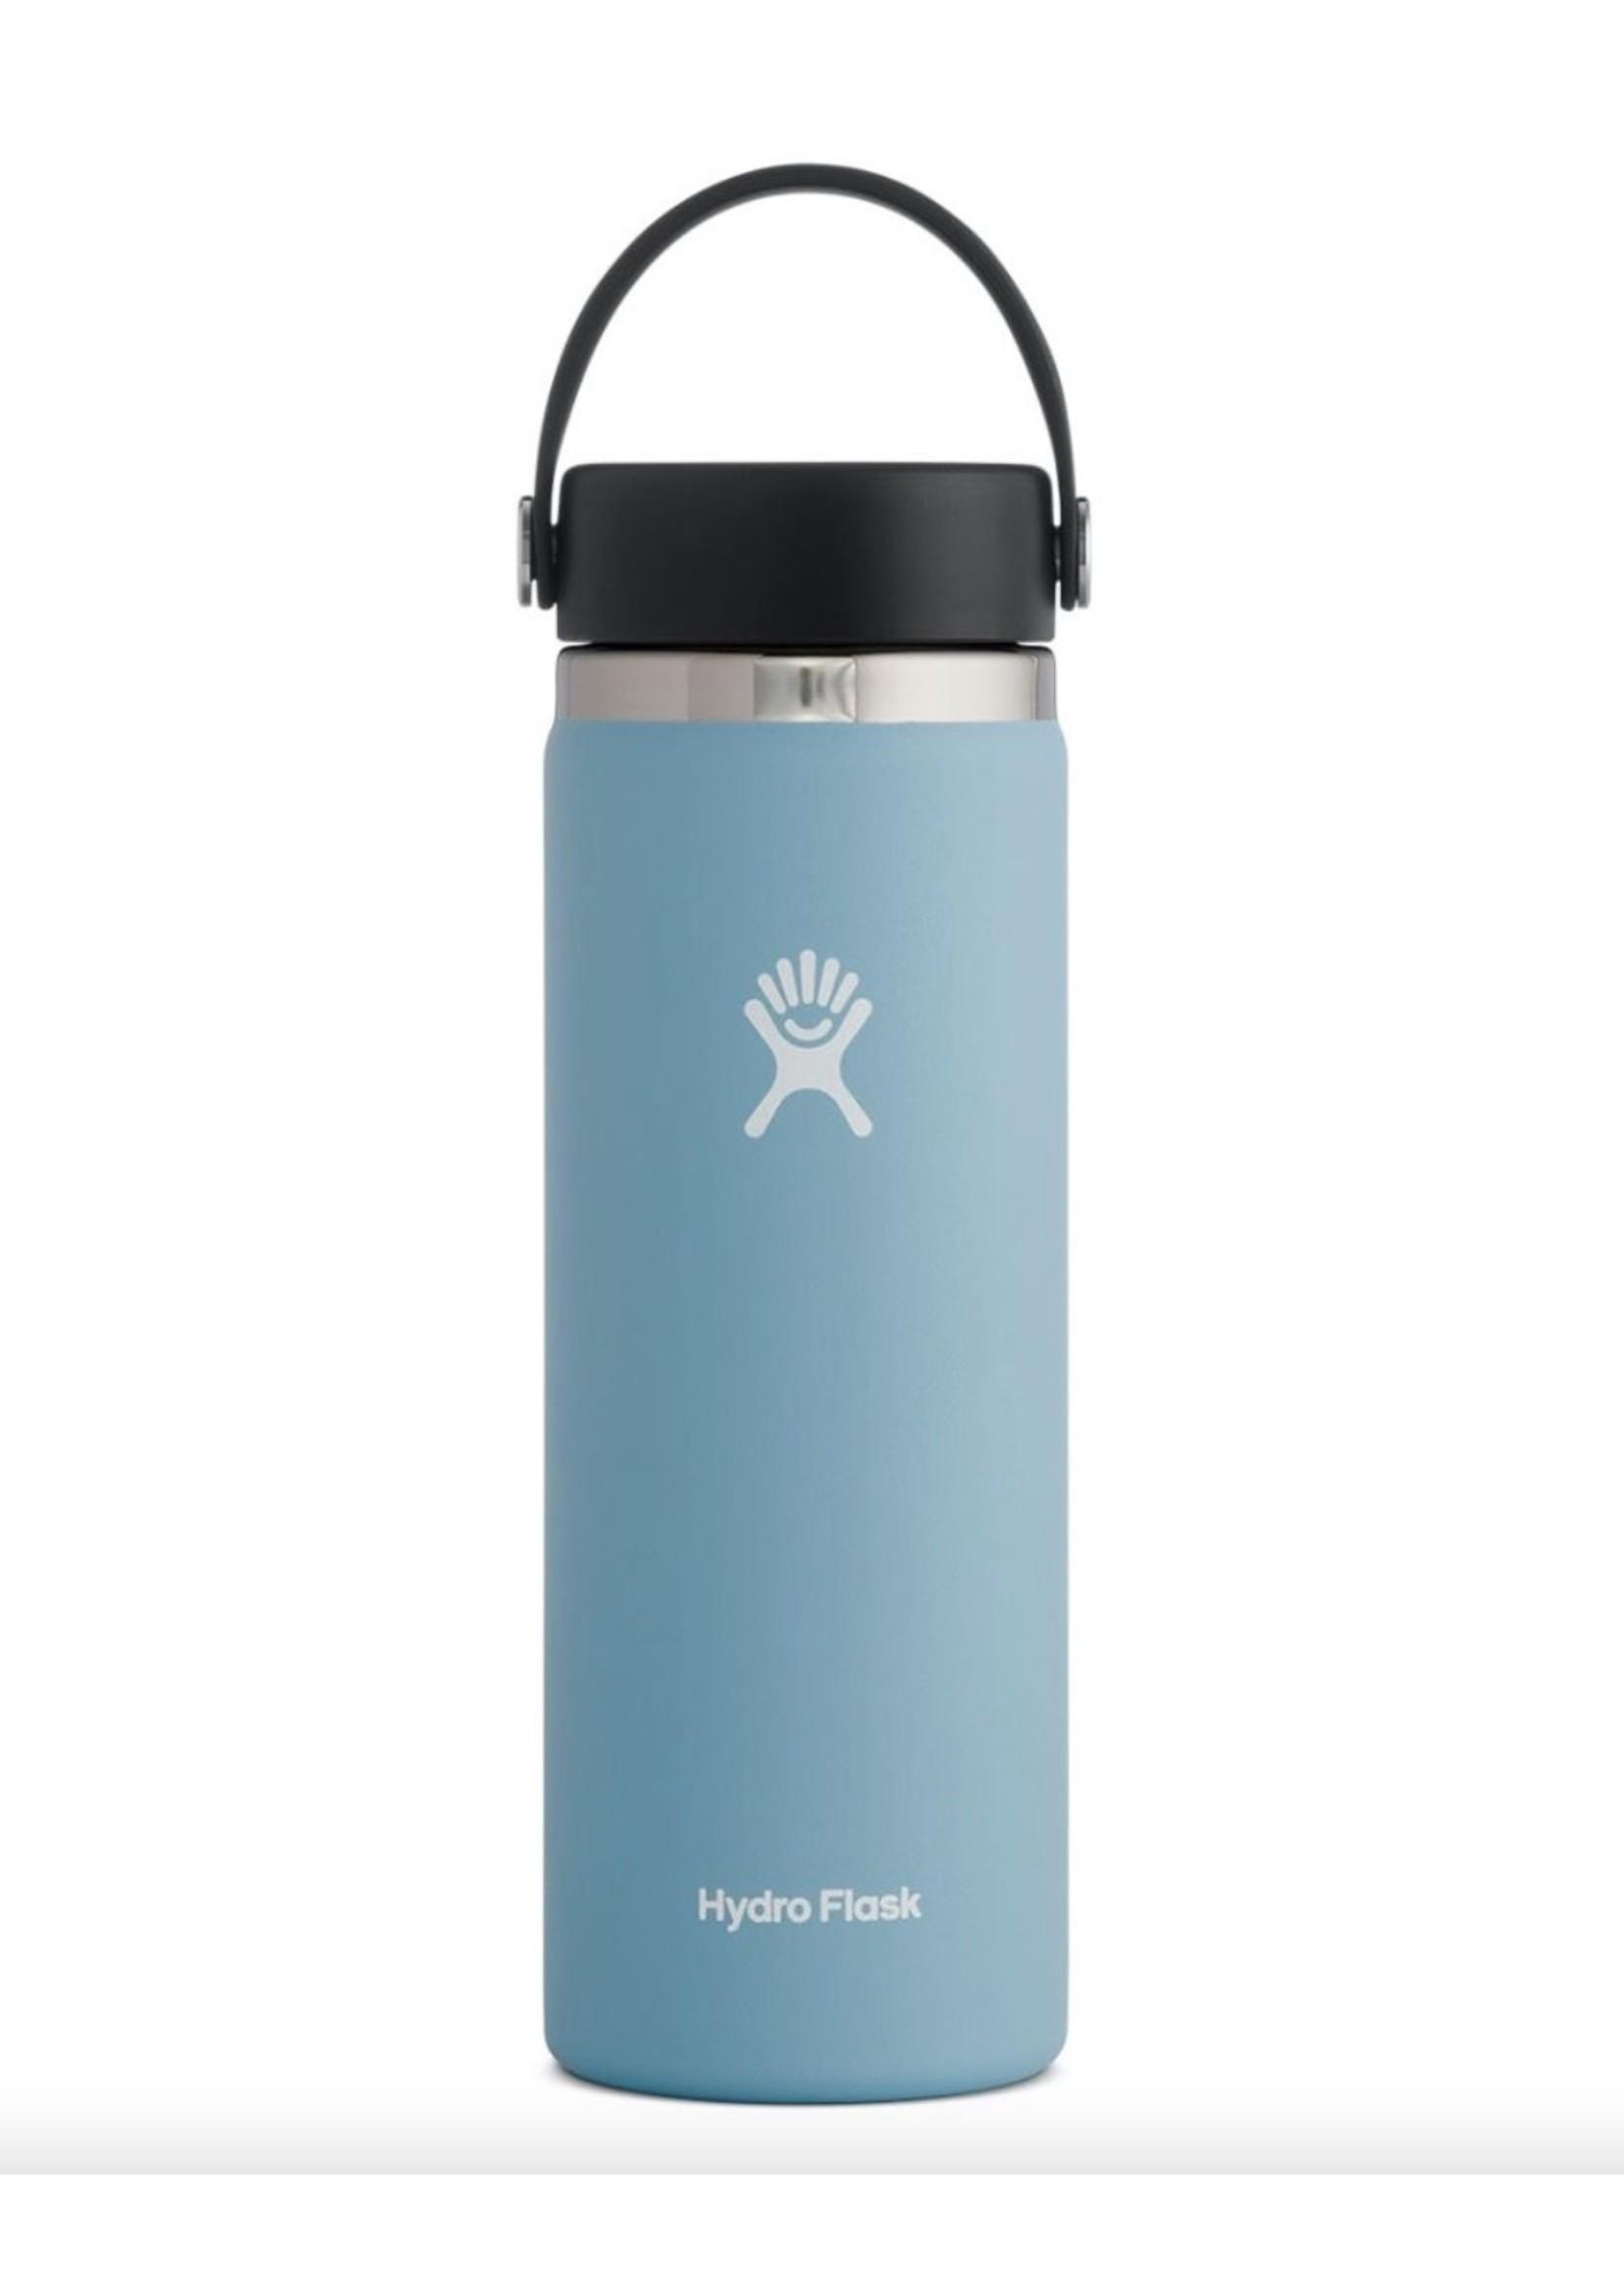 Hydro Flask Hydro Flask, 20 Oz Wide Mouth Flex Cap in Rain